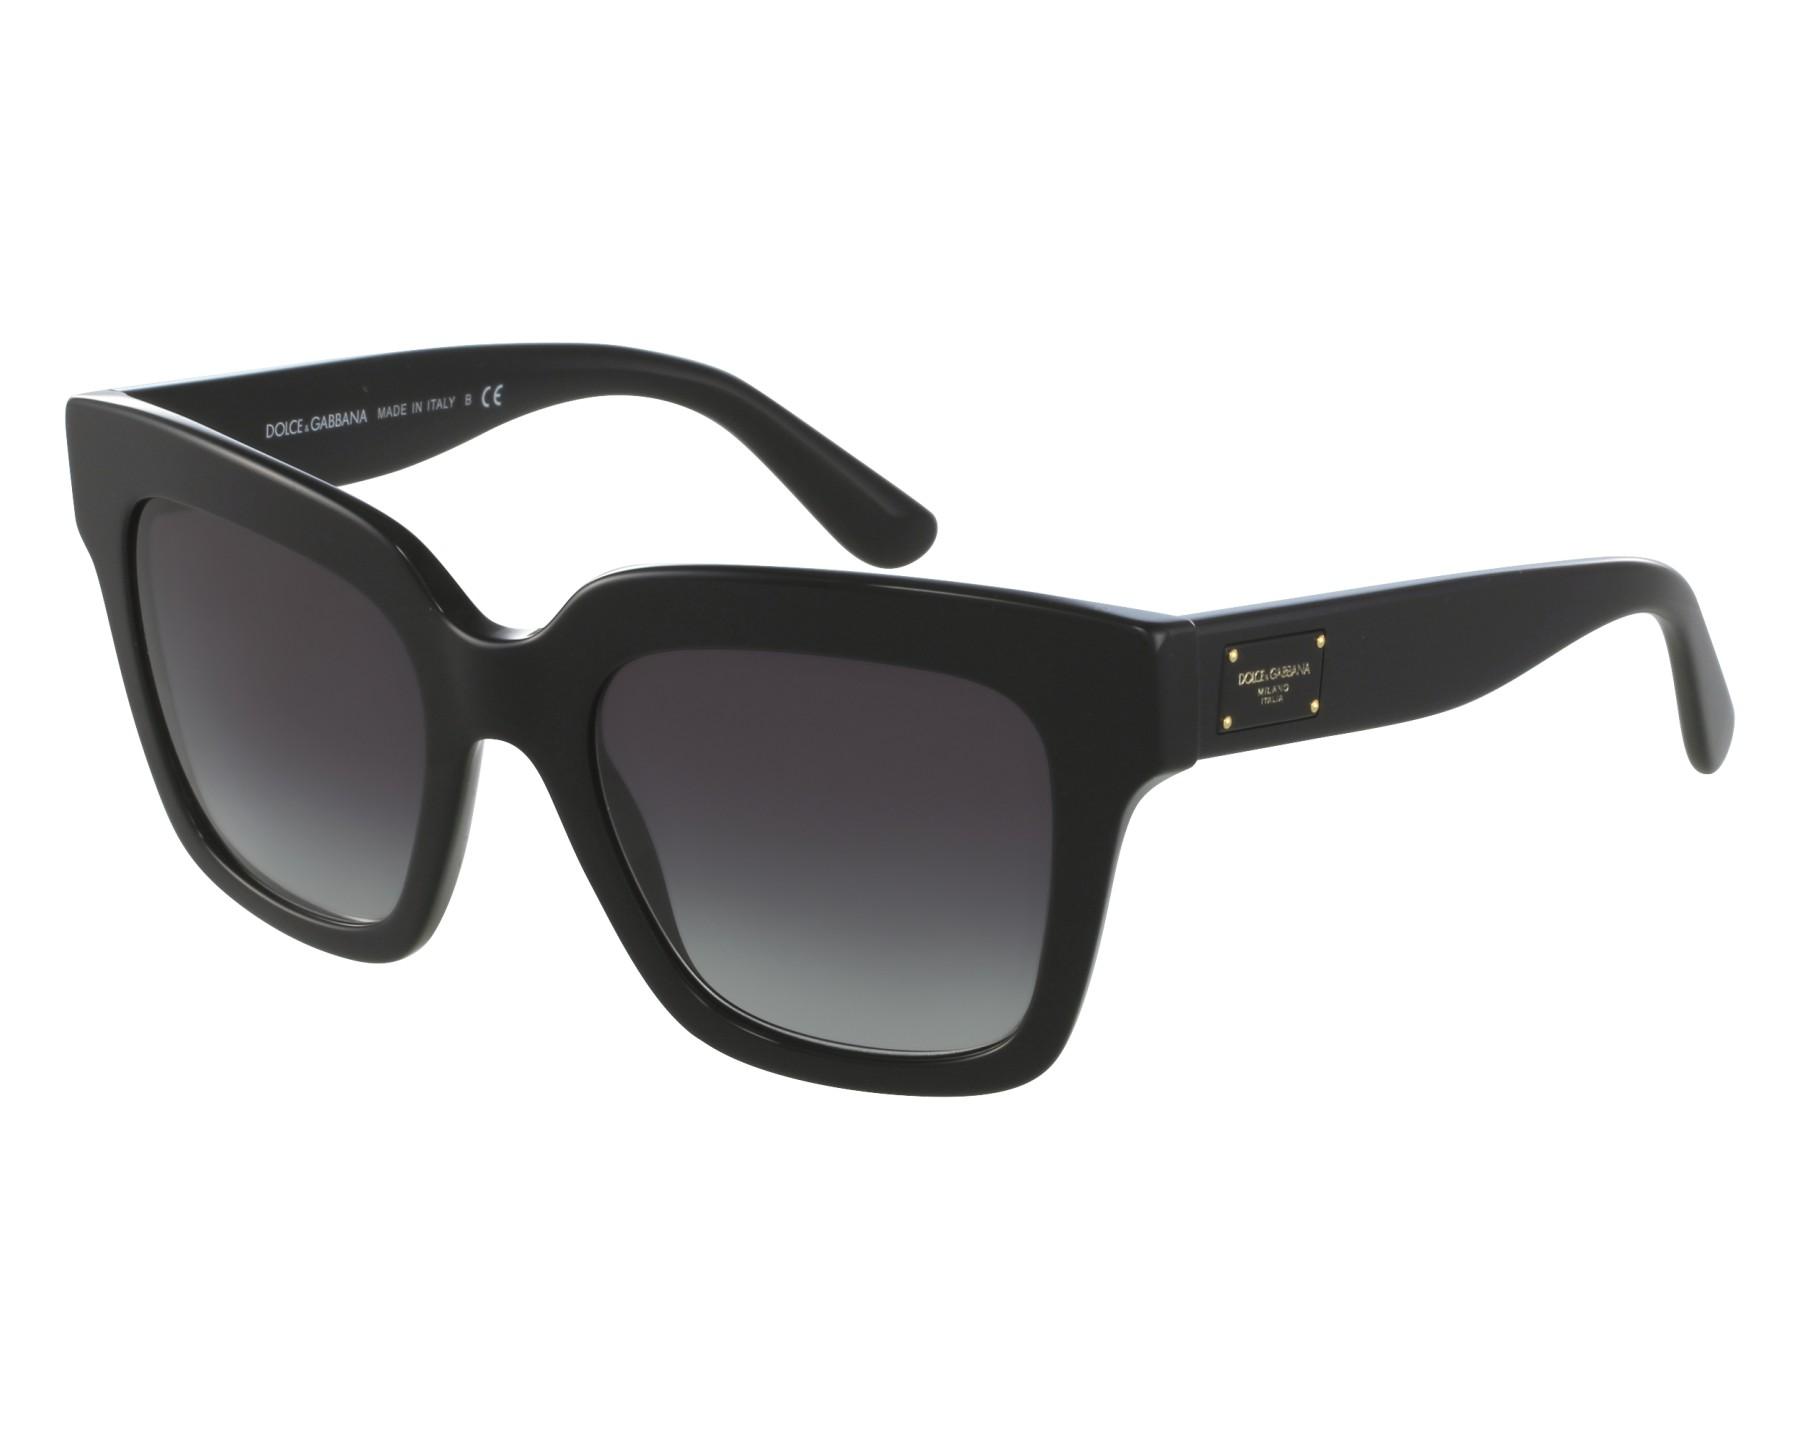 Dolce & Gabbana DG4286 501/8G 51 mm/20 mm AhLjeJL